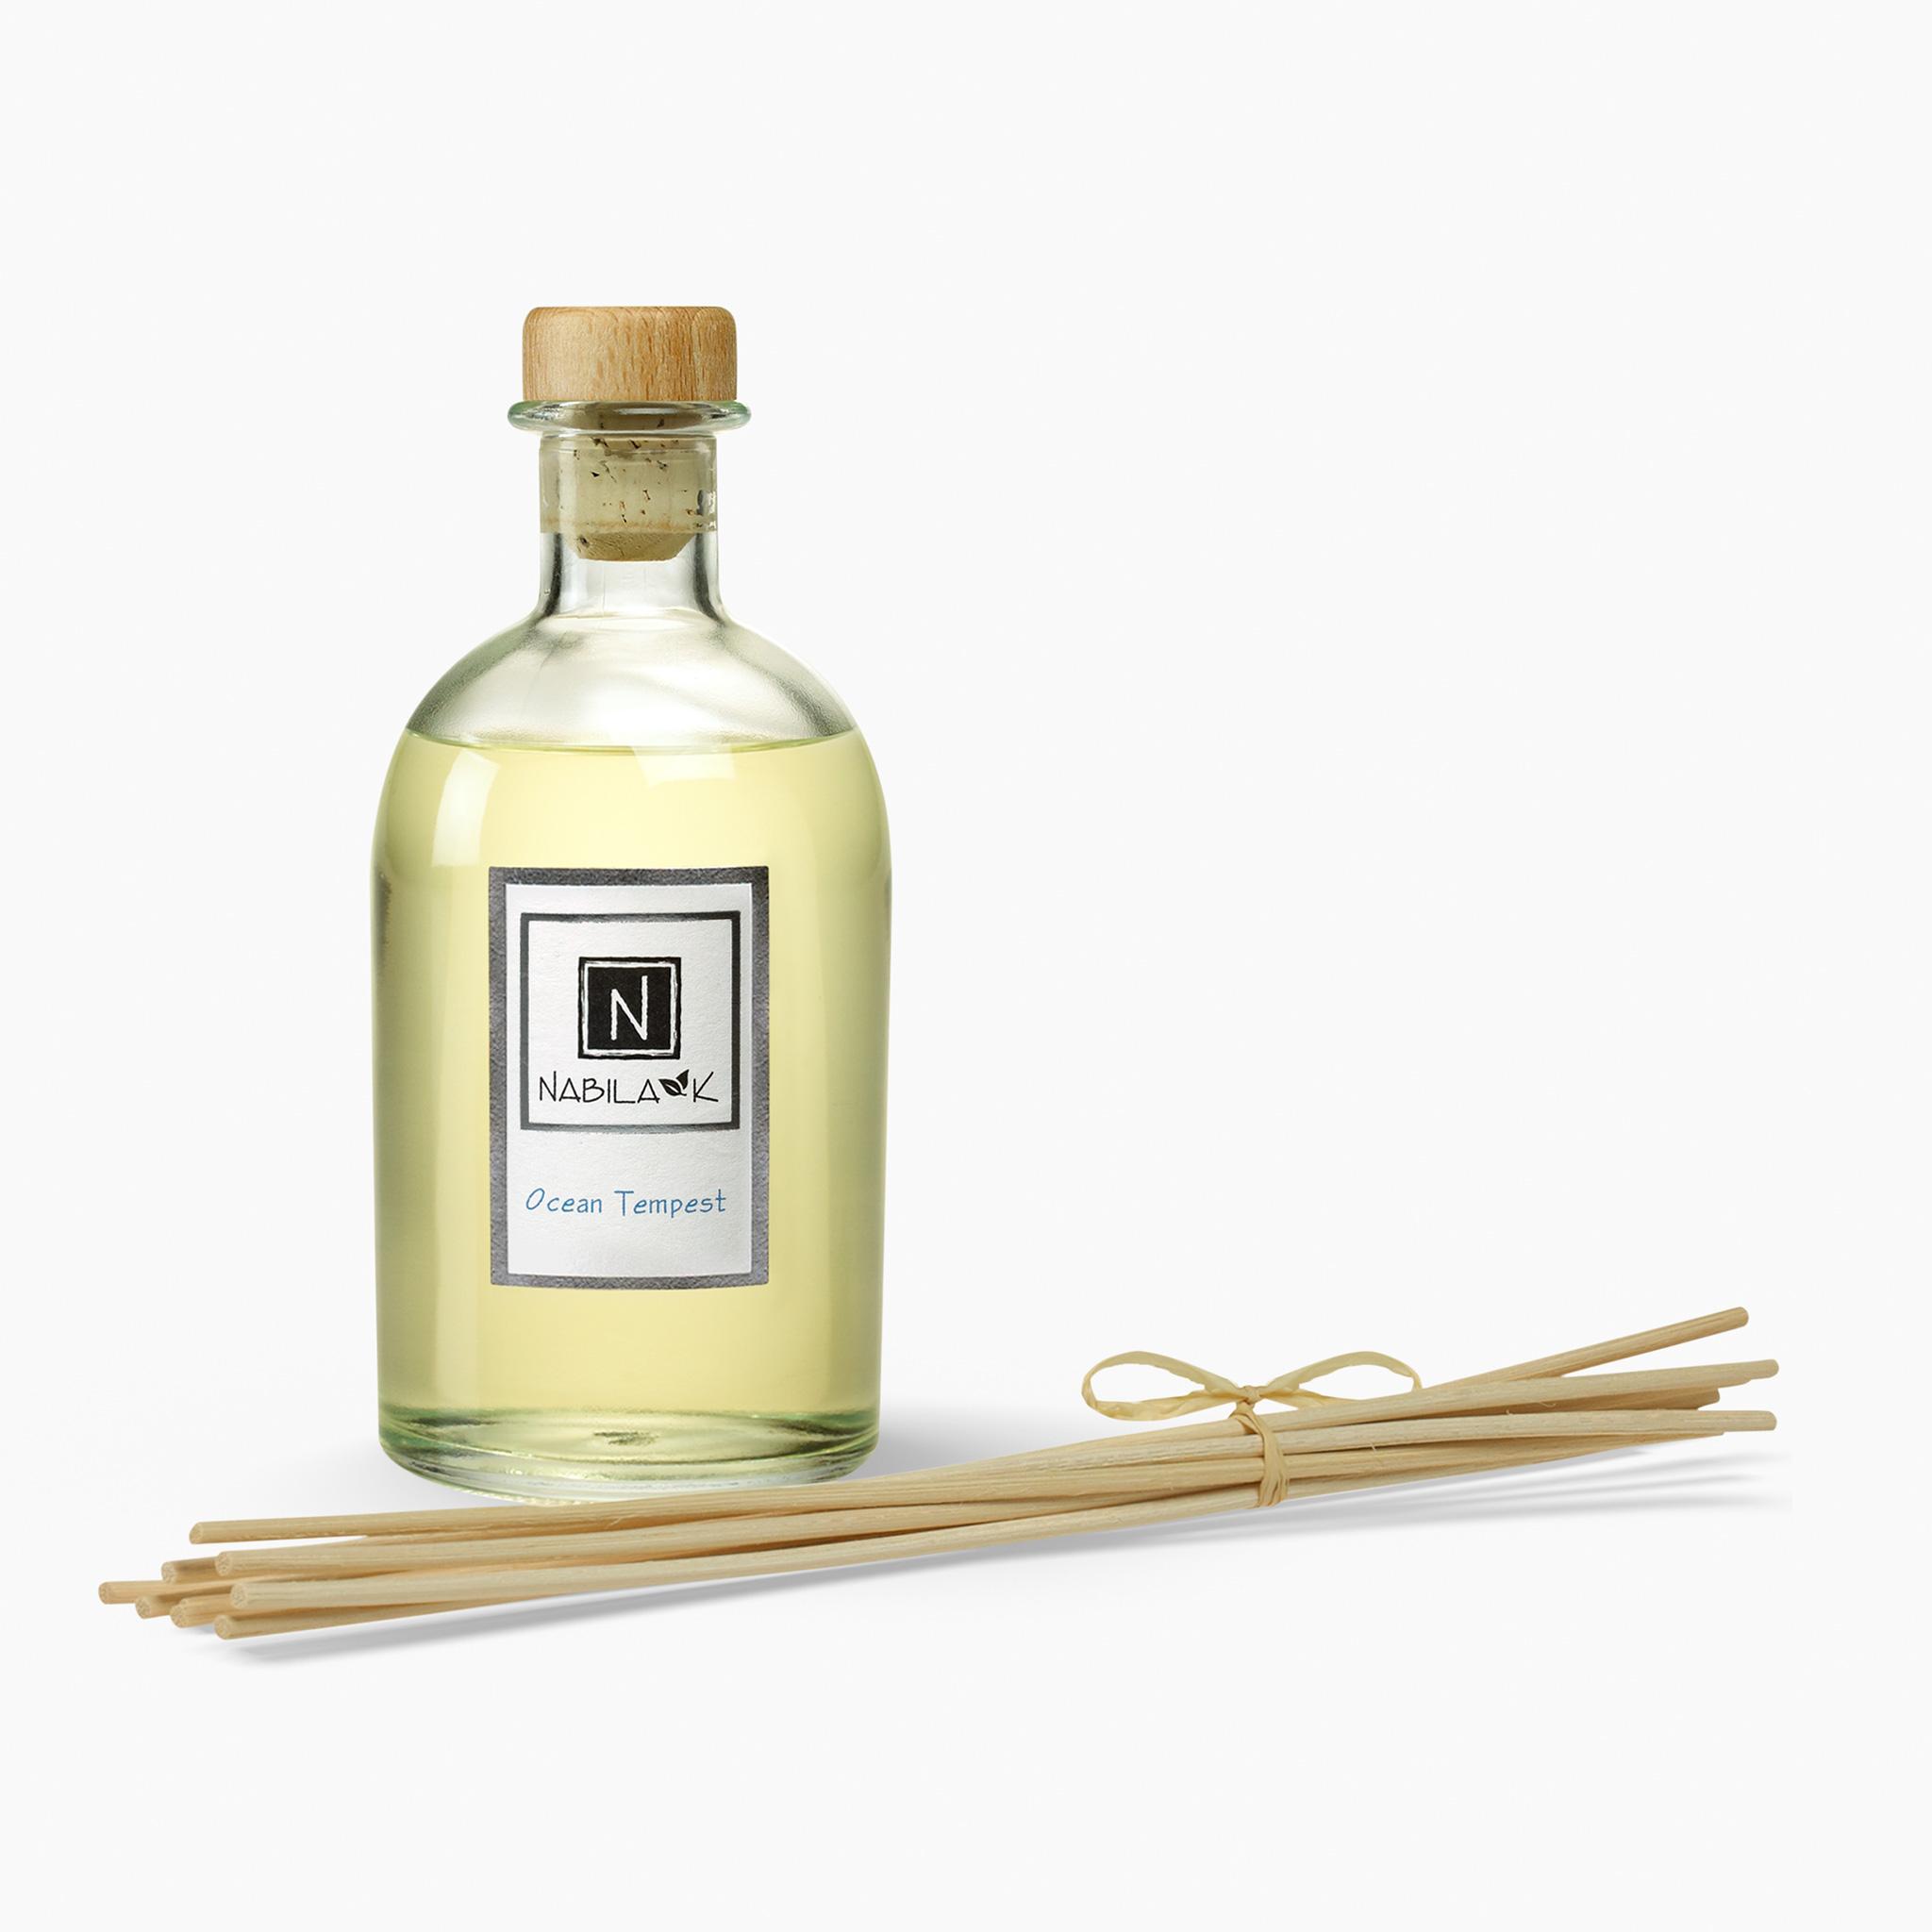 1 Bottle of Nabila K's Ocean Tempest Diffuser with Reeds